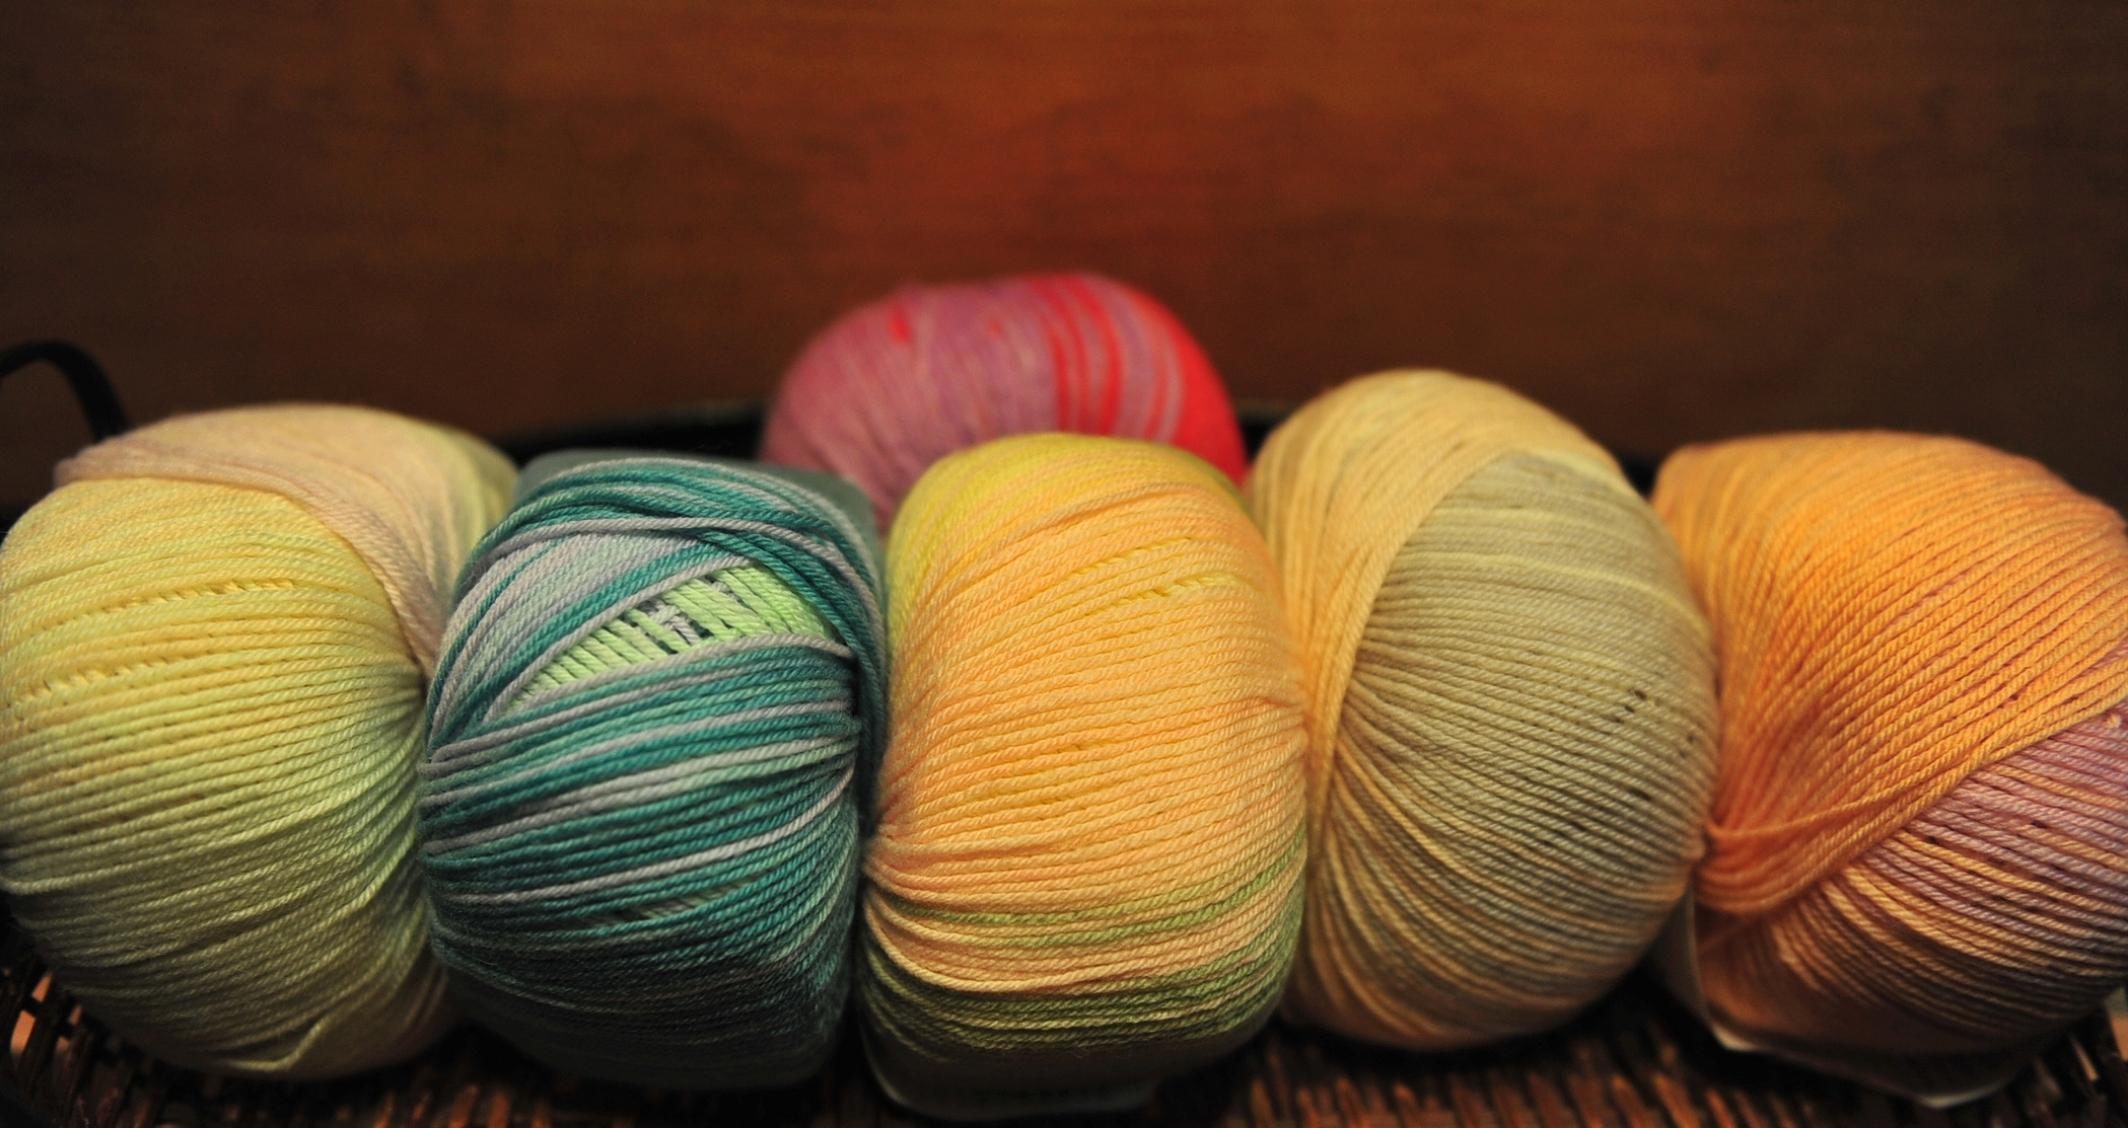 Wallpaper Sweater Fashion Greece Wool Woolen Yarn Thread Athens Hobby Create Art Natural Material Textile Fiber Knit Knitting Pullover Handknitting Sakalak Sakalakwool Merino 2128x1128 768928 Hd Wallpapers Wallhere